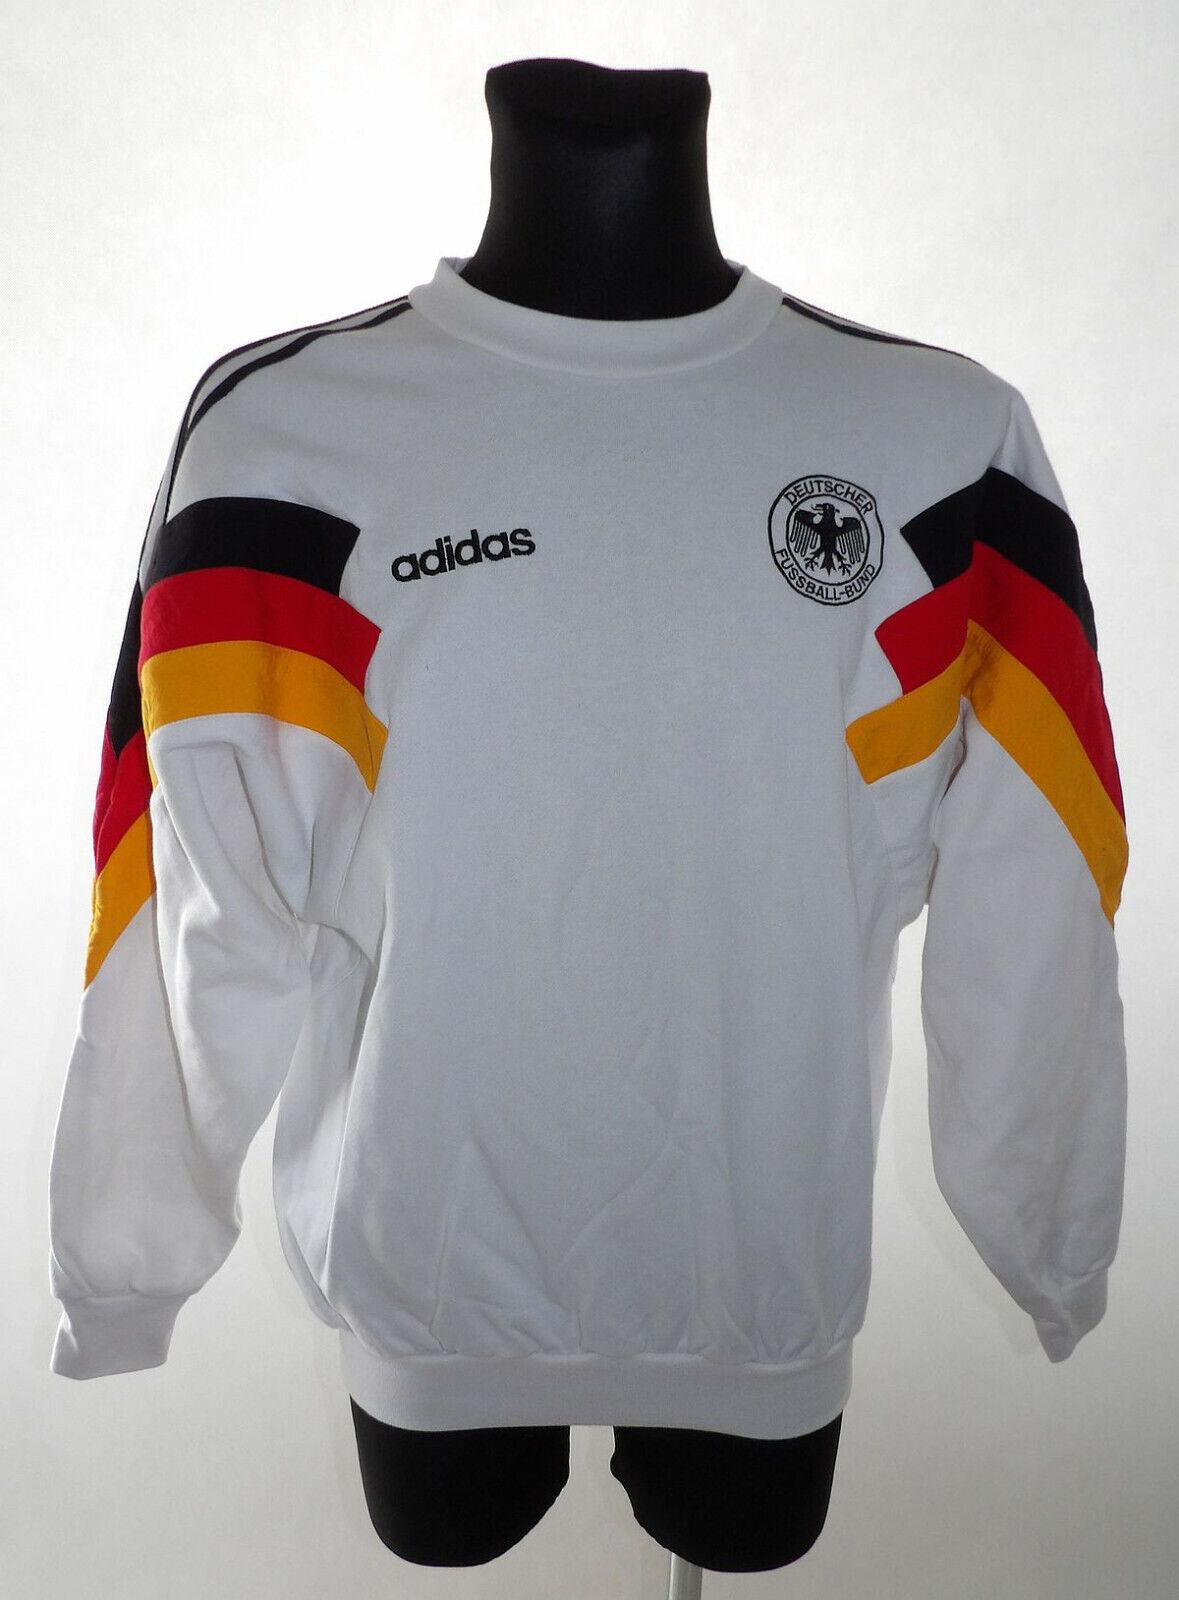 Vintage Deutschland 1992 Adidas D5 Sweatshirt  M  Shirt Jersey Trikot Germany